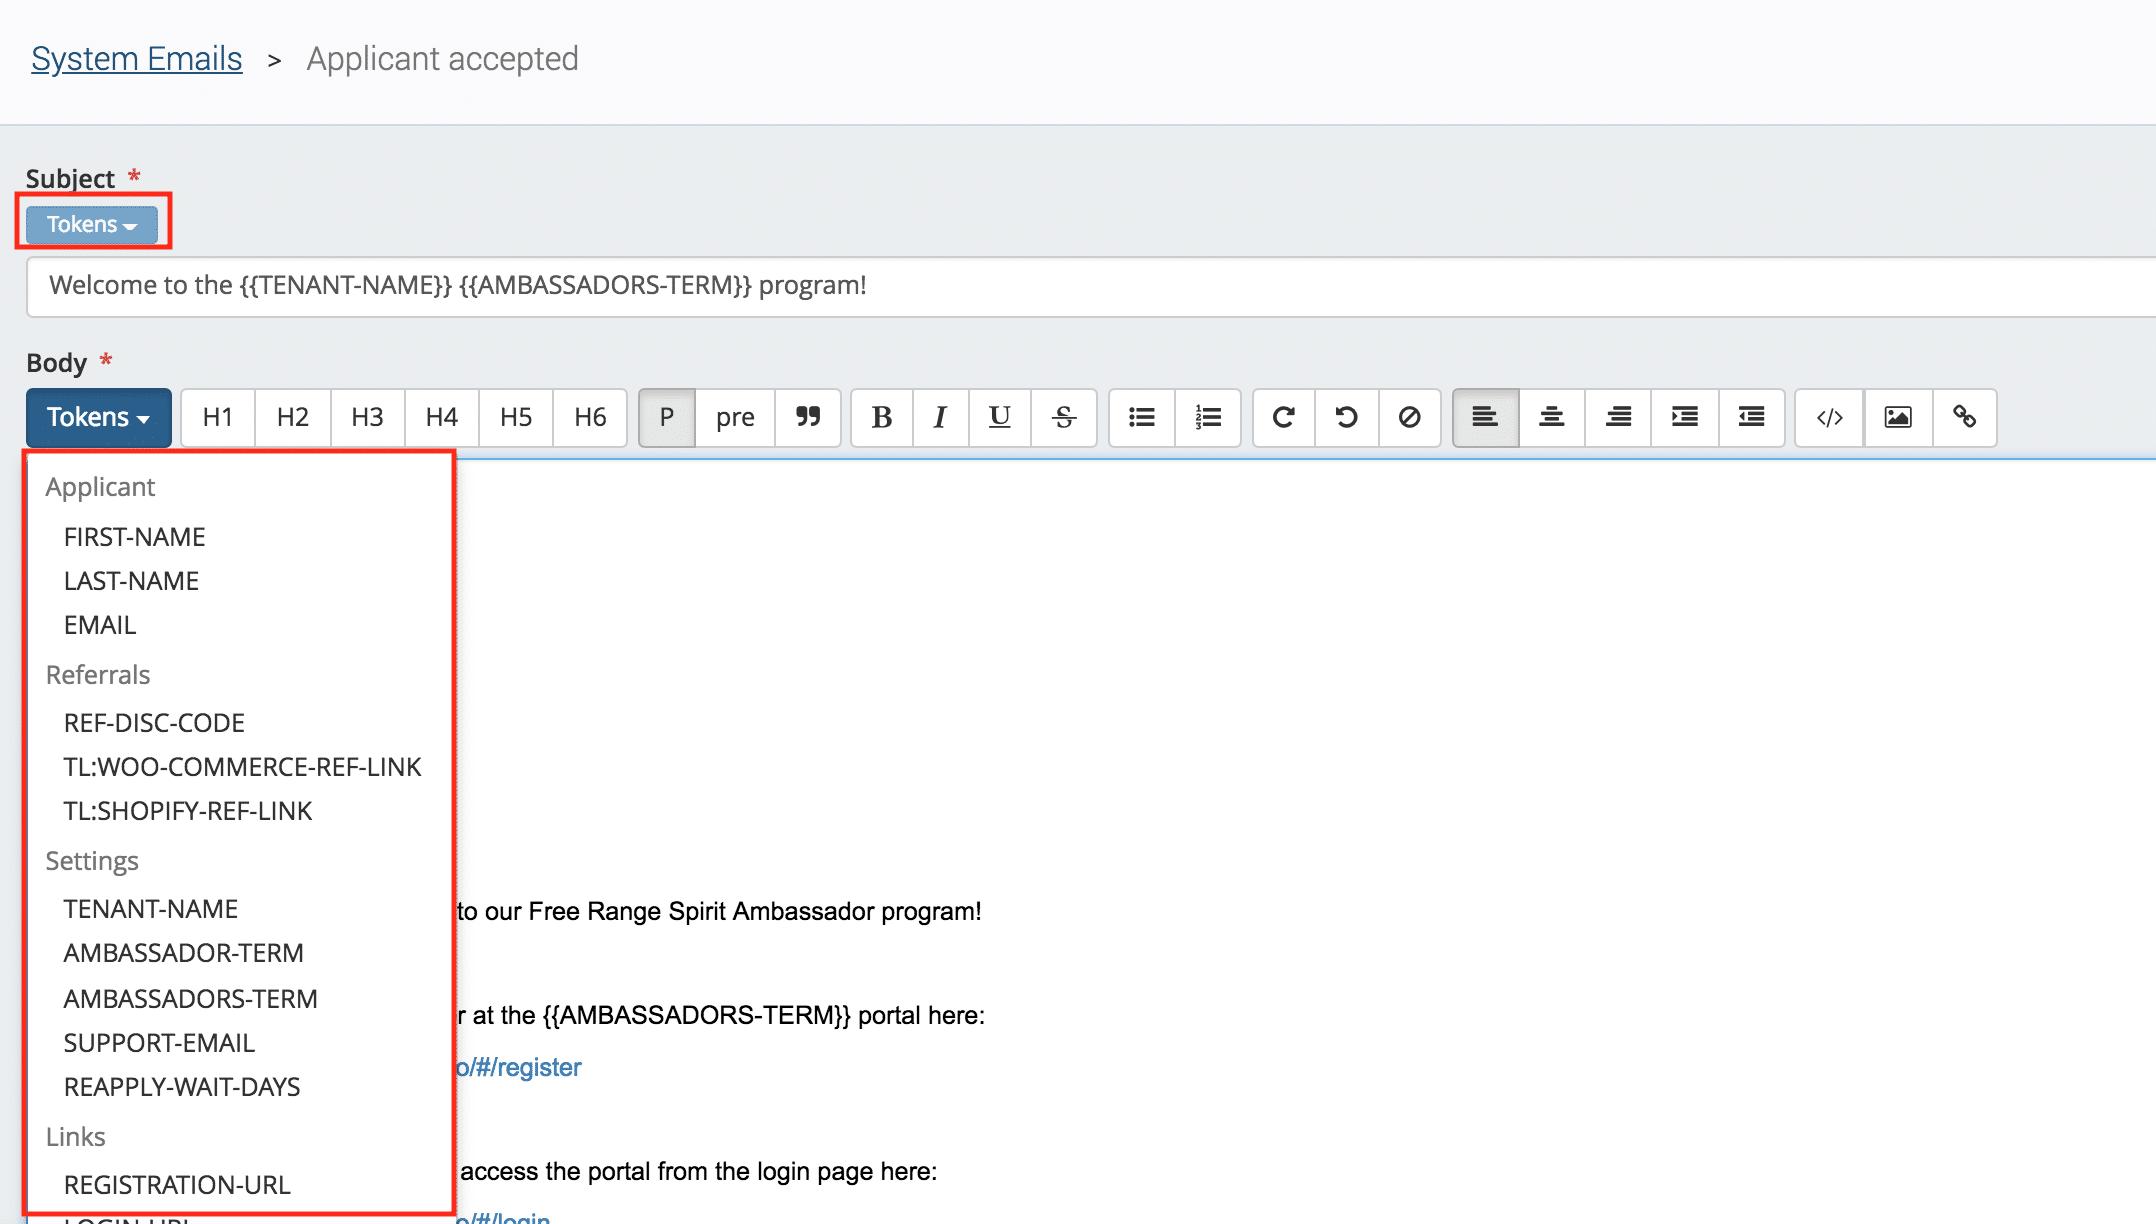 BrandChamp ambassador system email welcome email tokens